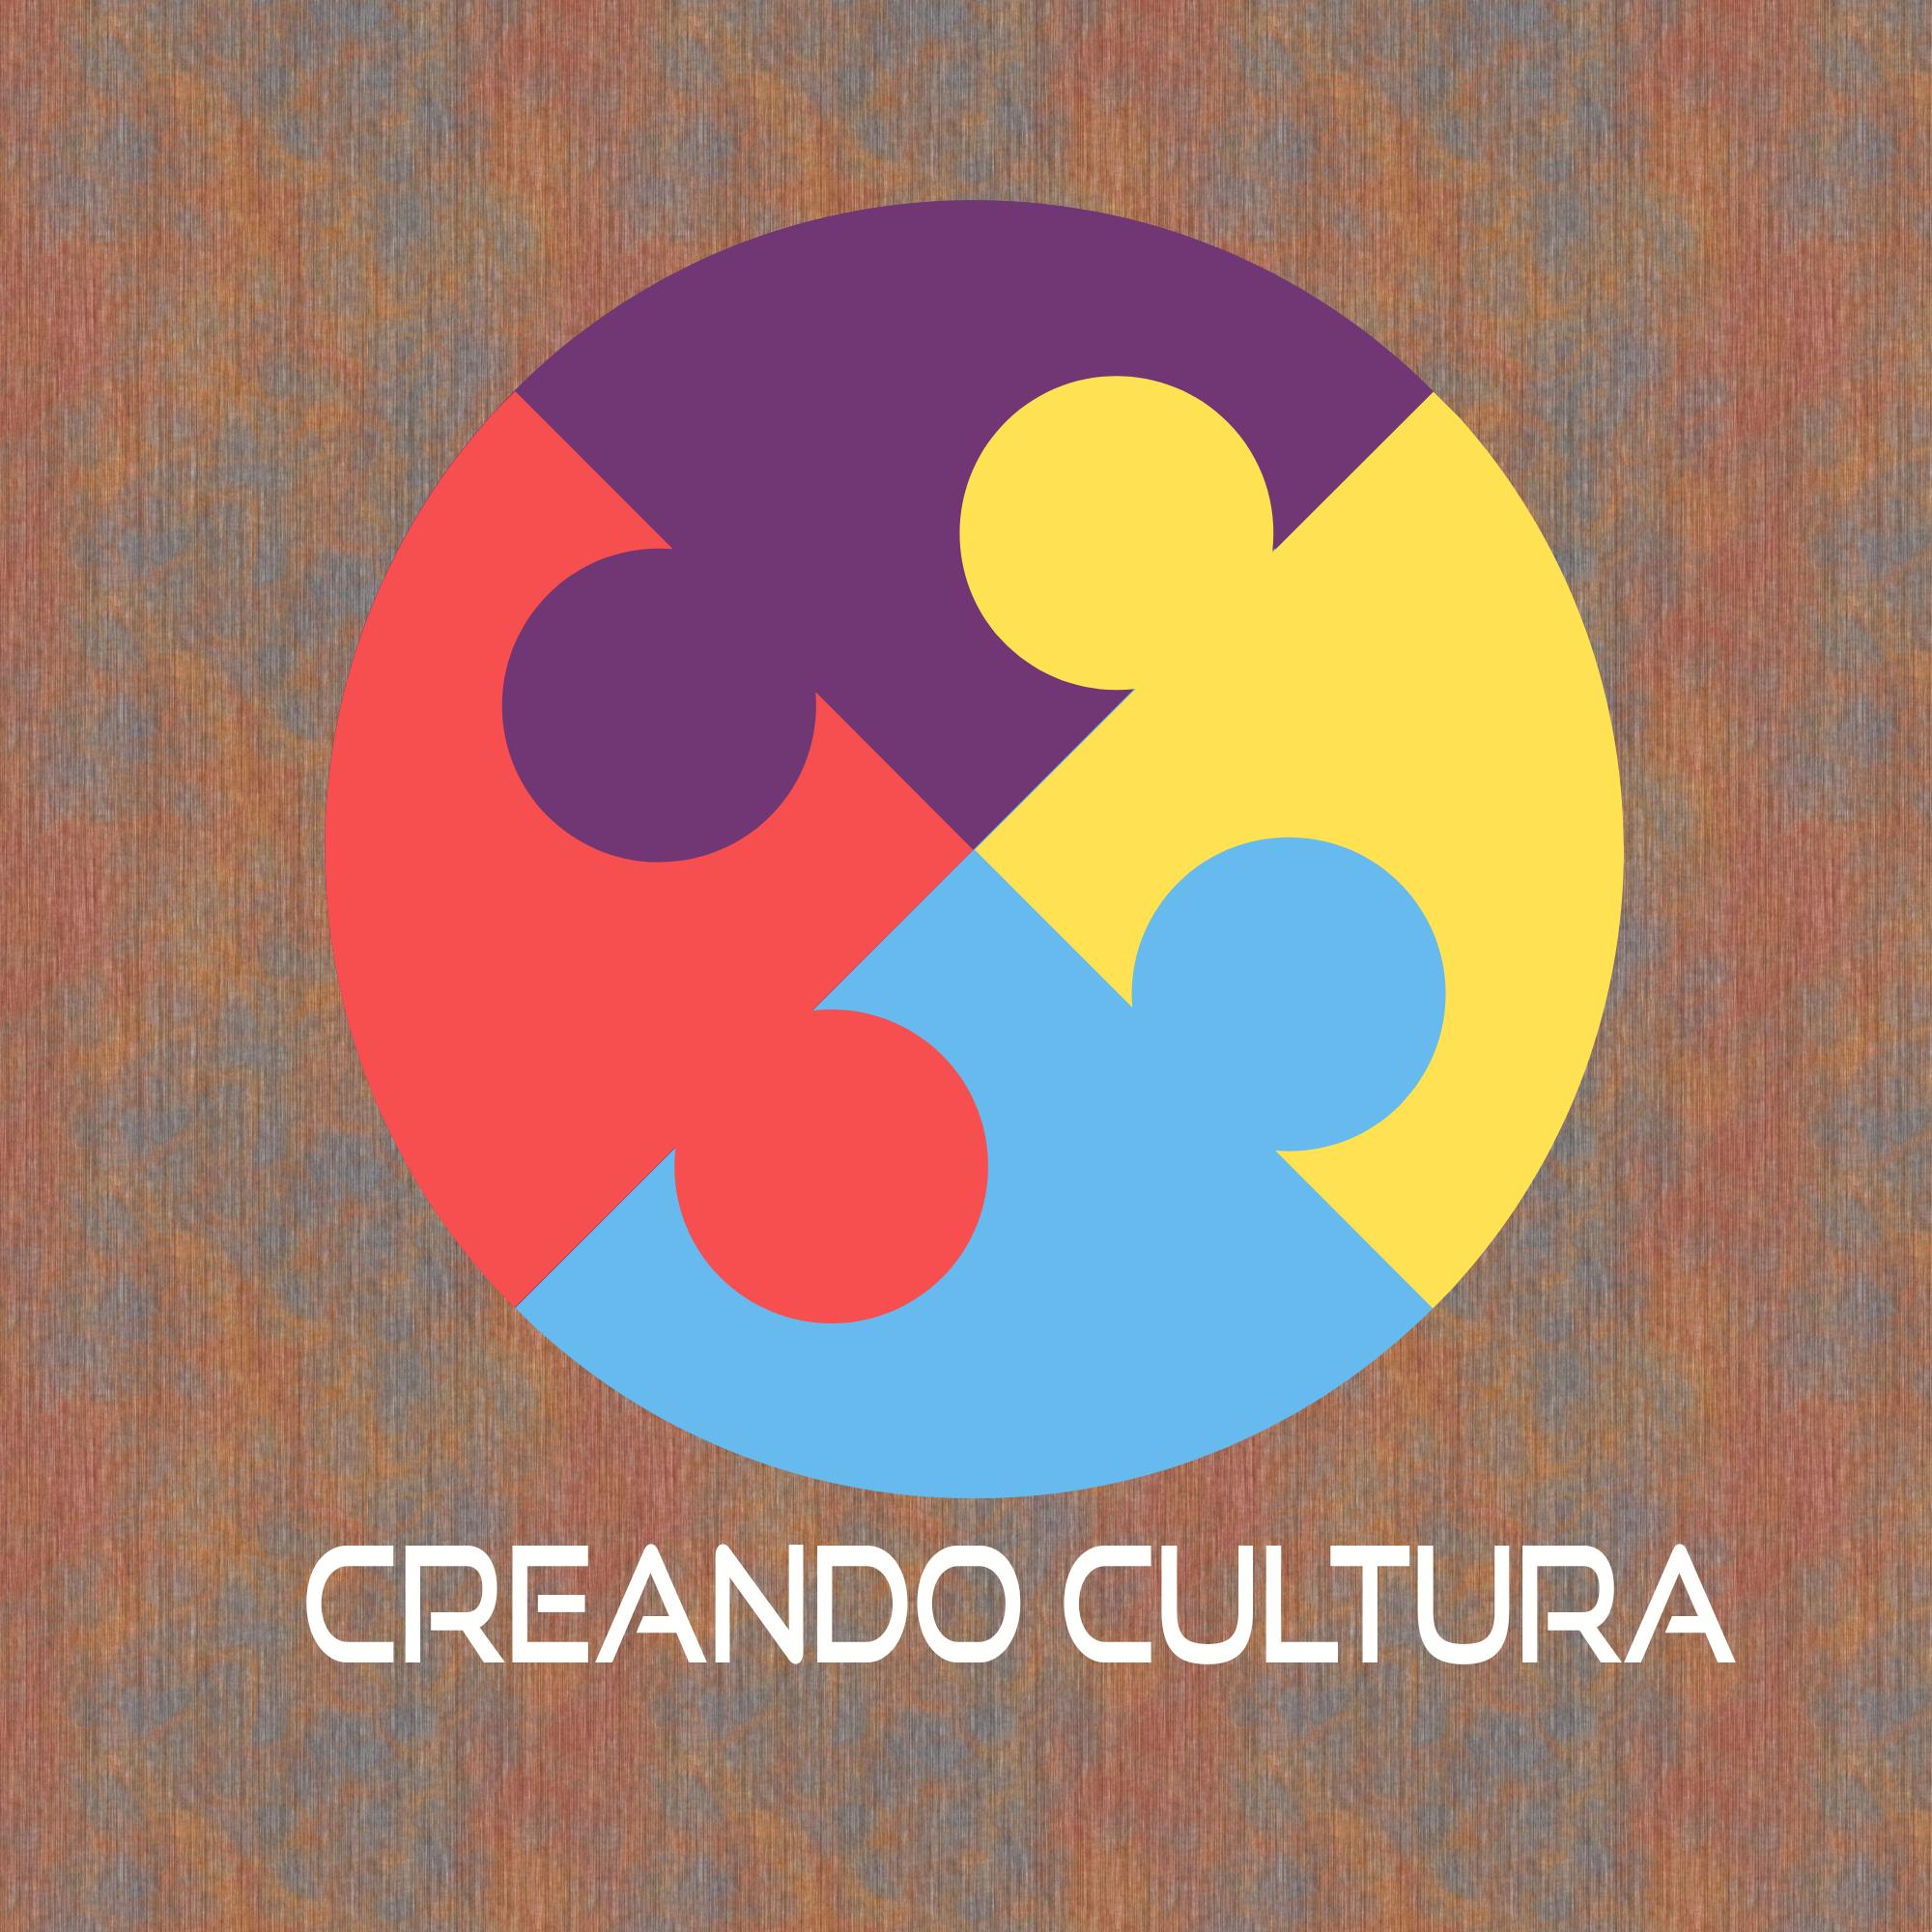 CREANDO CULTURA